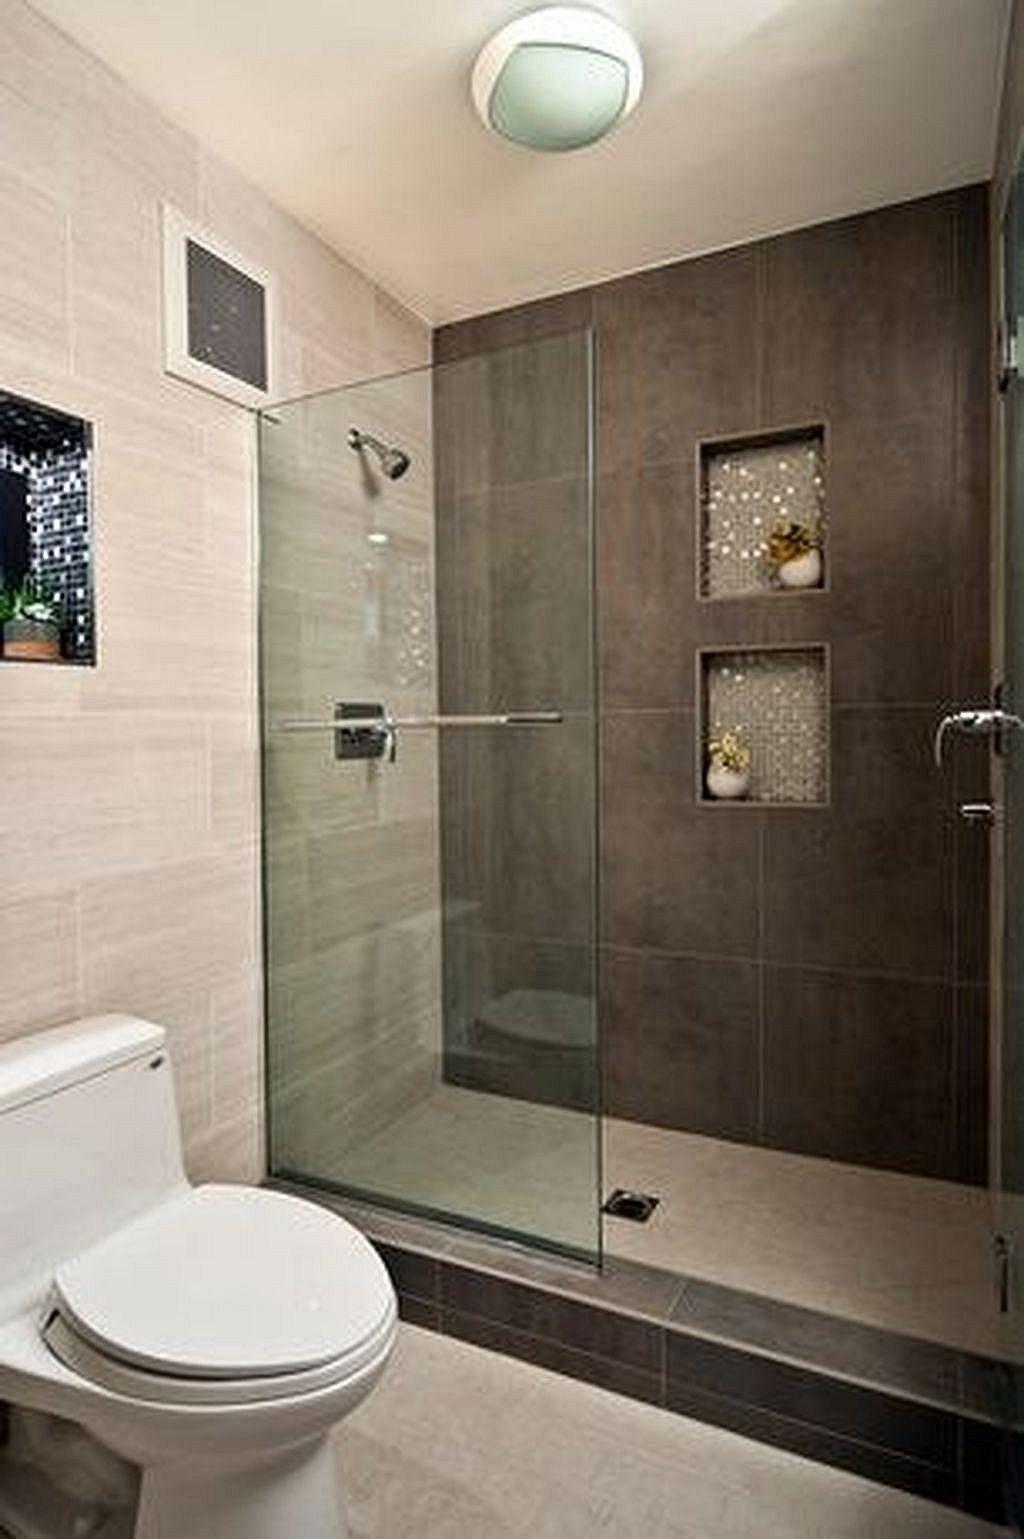 Great 10 Elegant And Modern Bathroom Shower Tile Master Bath Ideas Diseno De Banos Decoracion De Banos Modernos Diseno Banos Pequenos